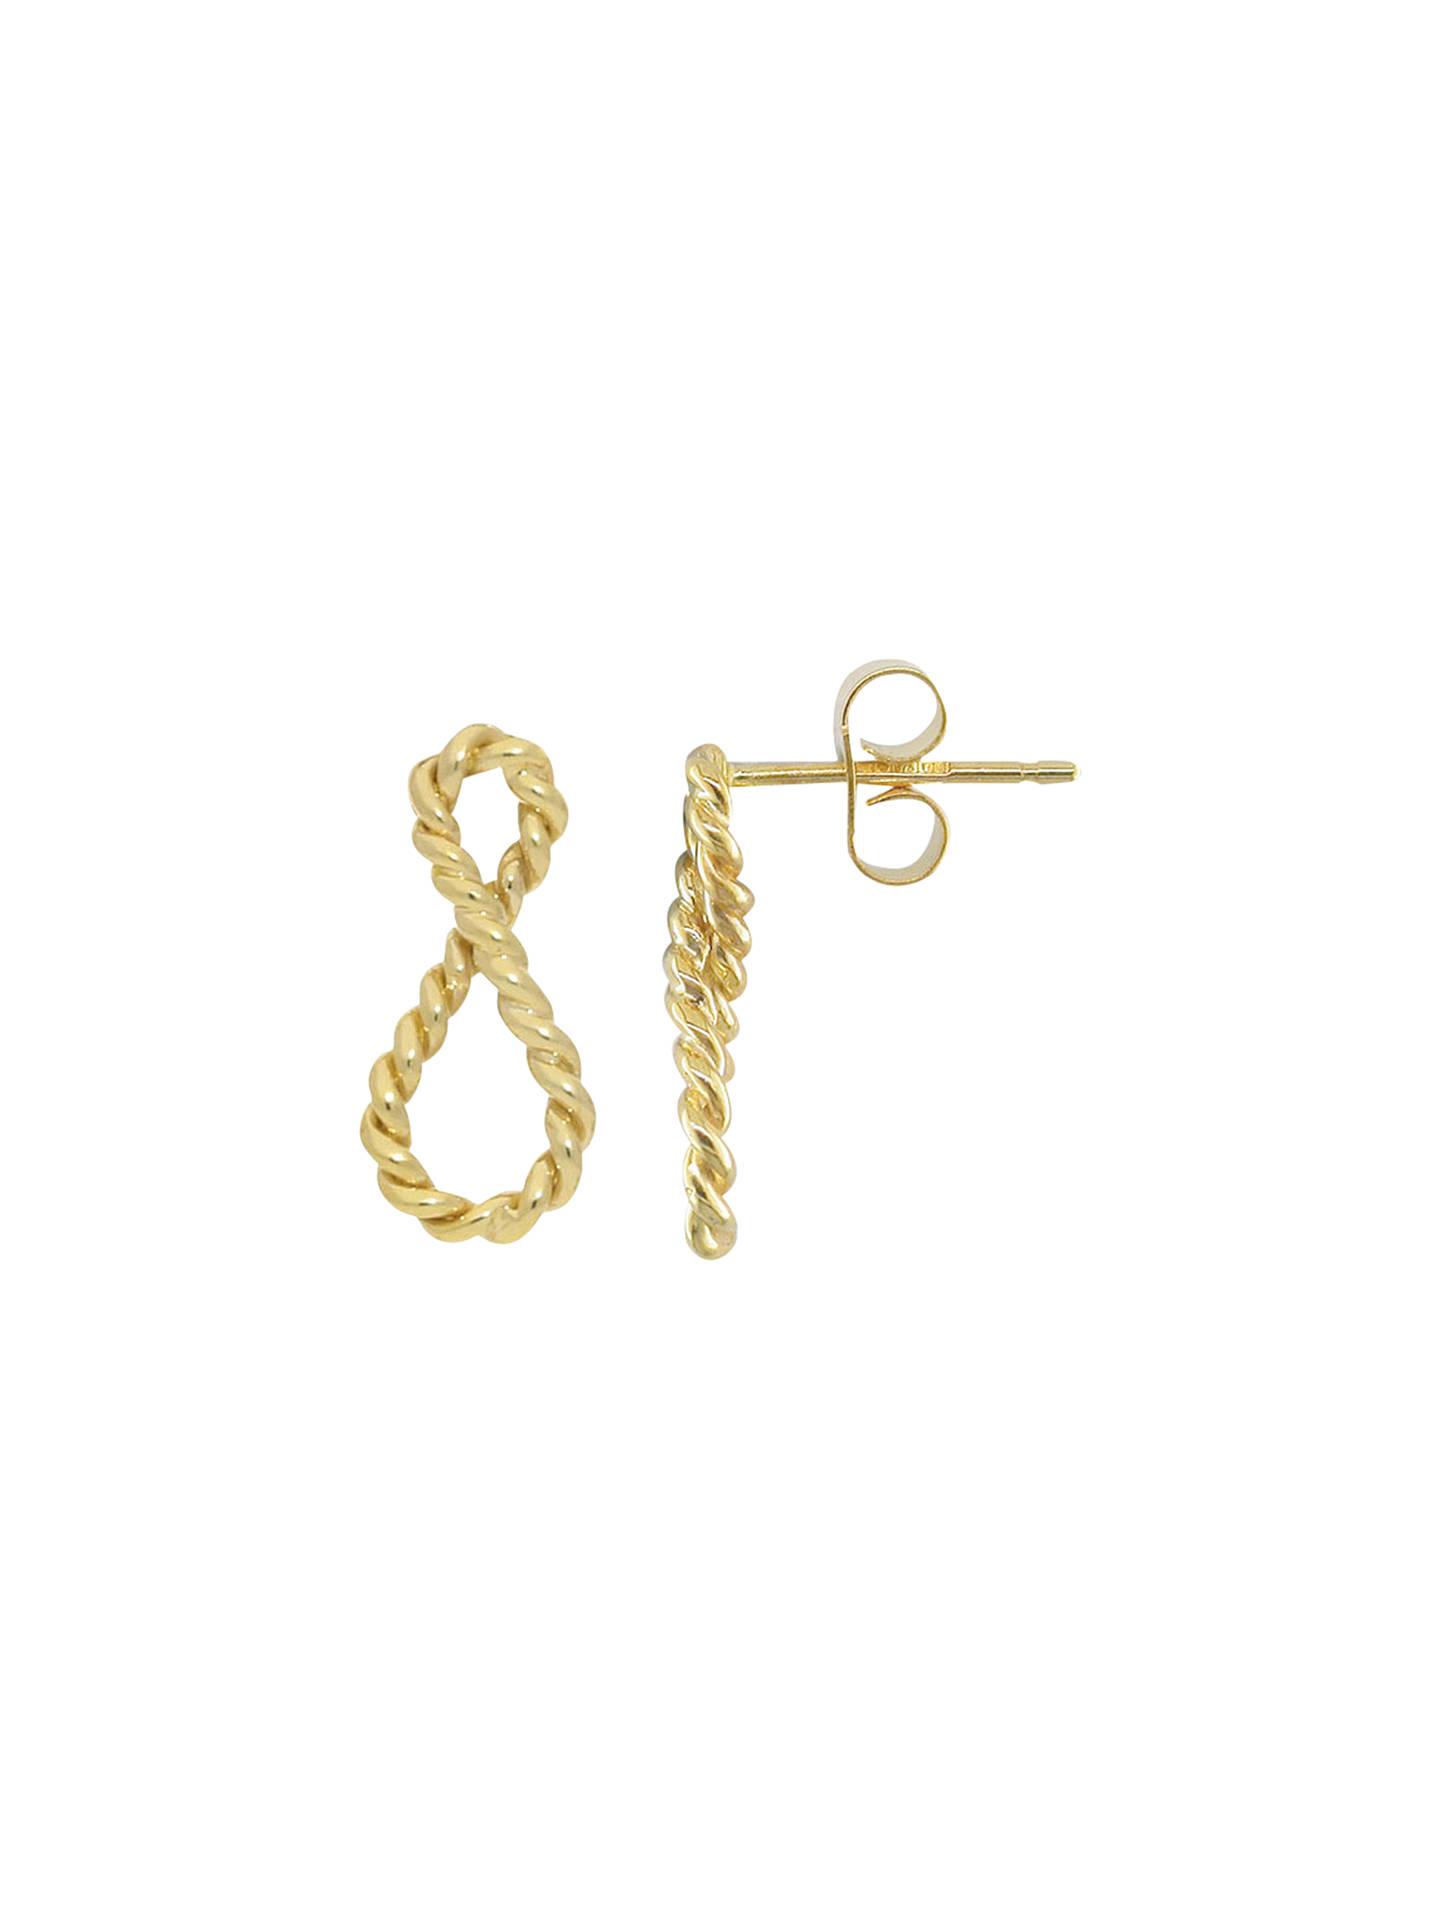 London Road 9ct Gold Infinity Earrings Online At Johnlewis